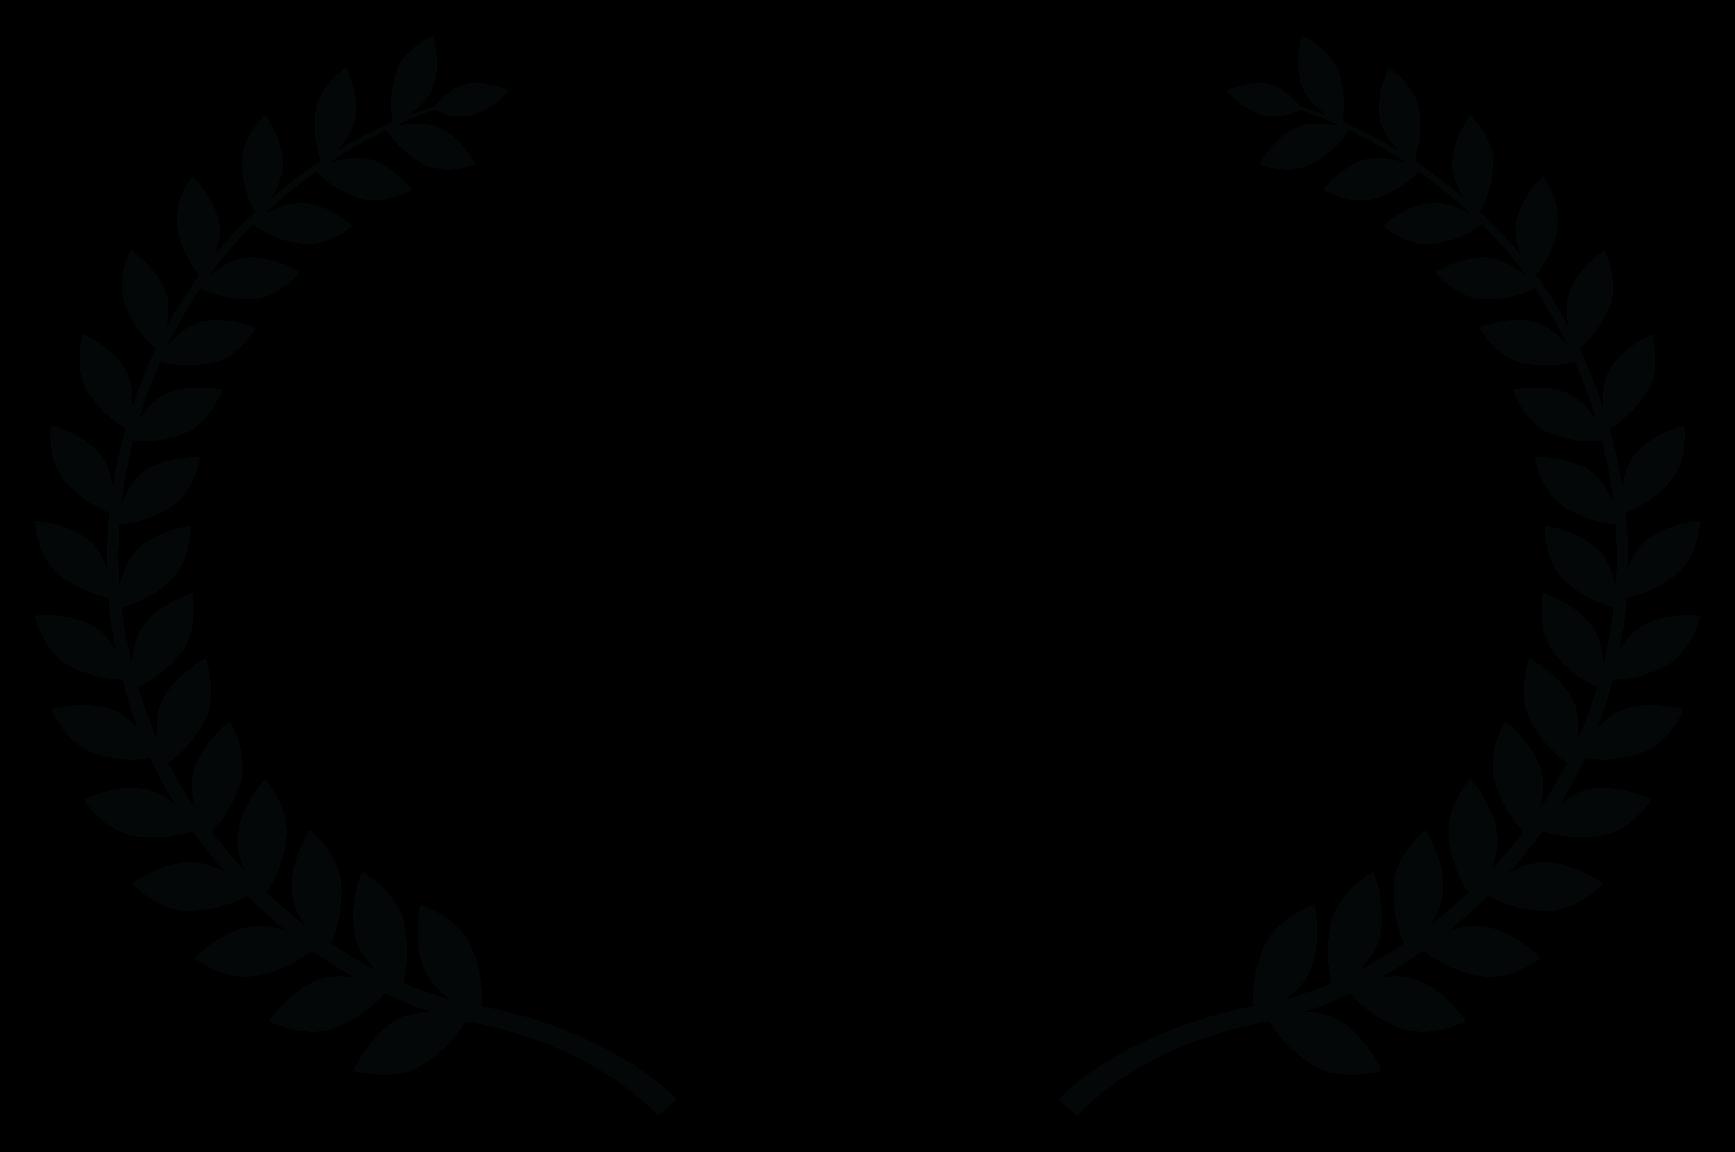 OFFICIAL SELECTION - Euro Fest European International Film Festival - 2021 (1)